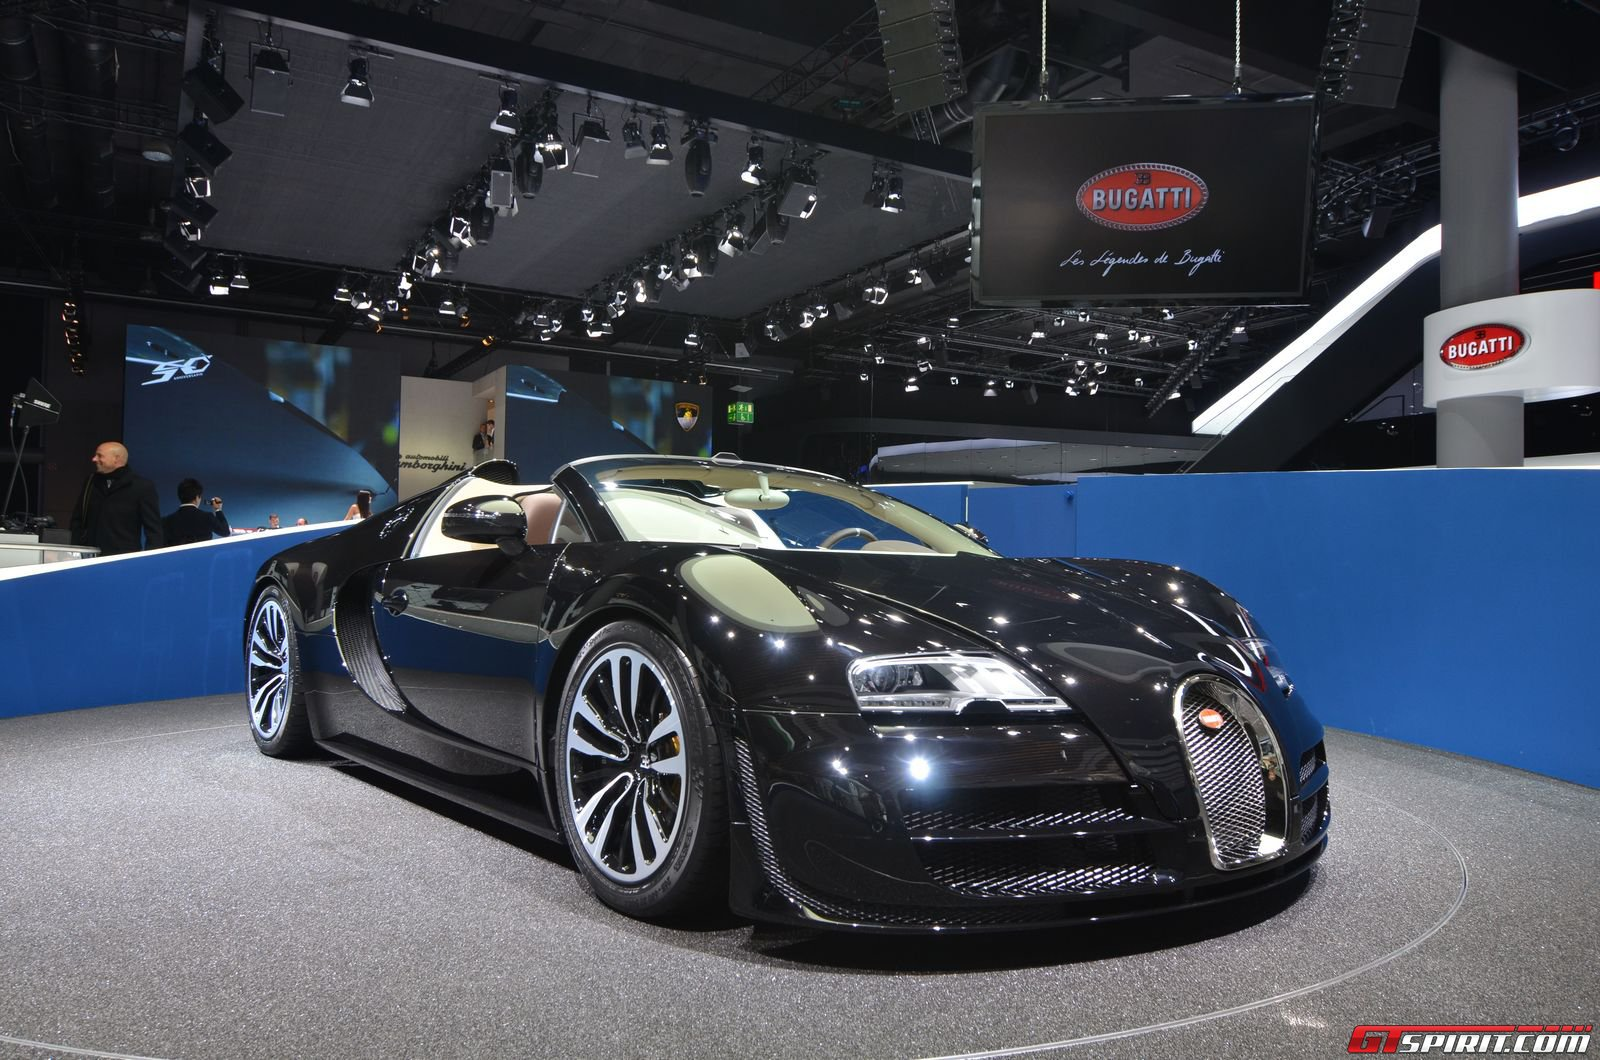 frankfurt 2013 bugatti veyron vitesse legend edition. Black Bedroom Furniture Sets. Home Design Ideas